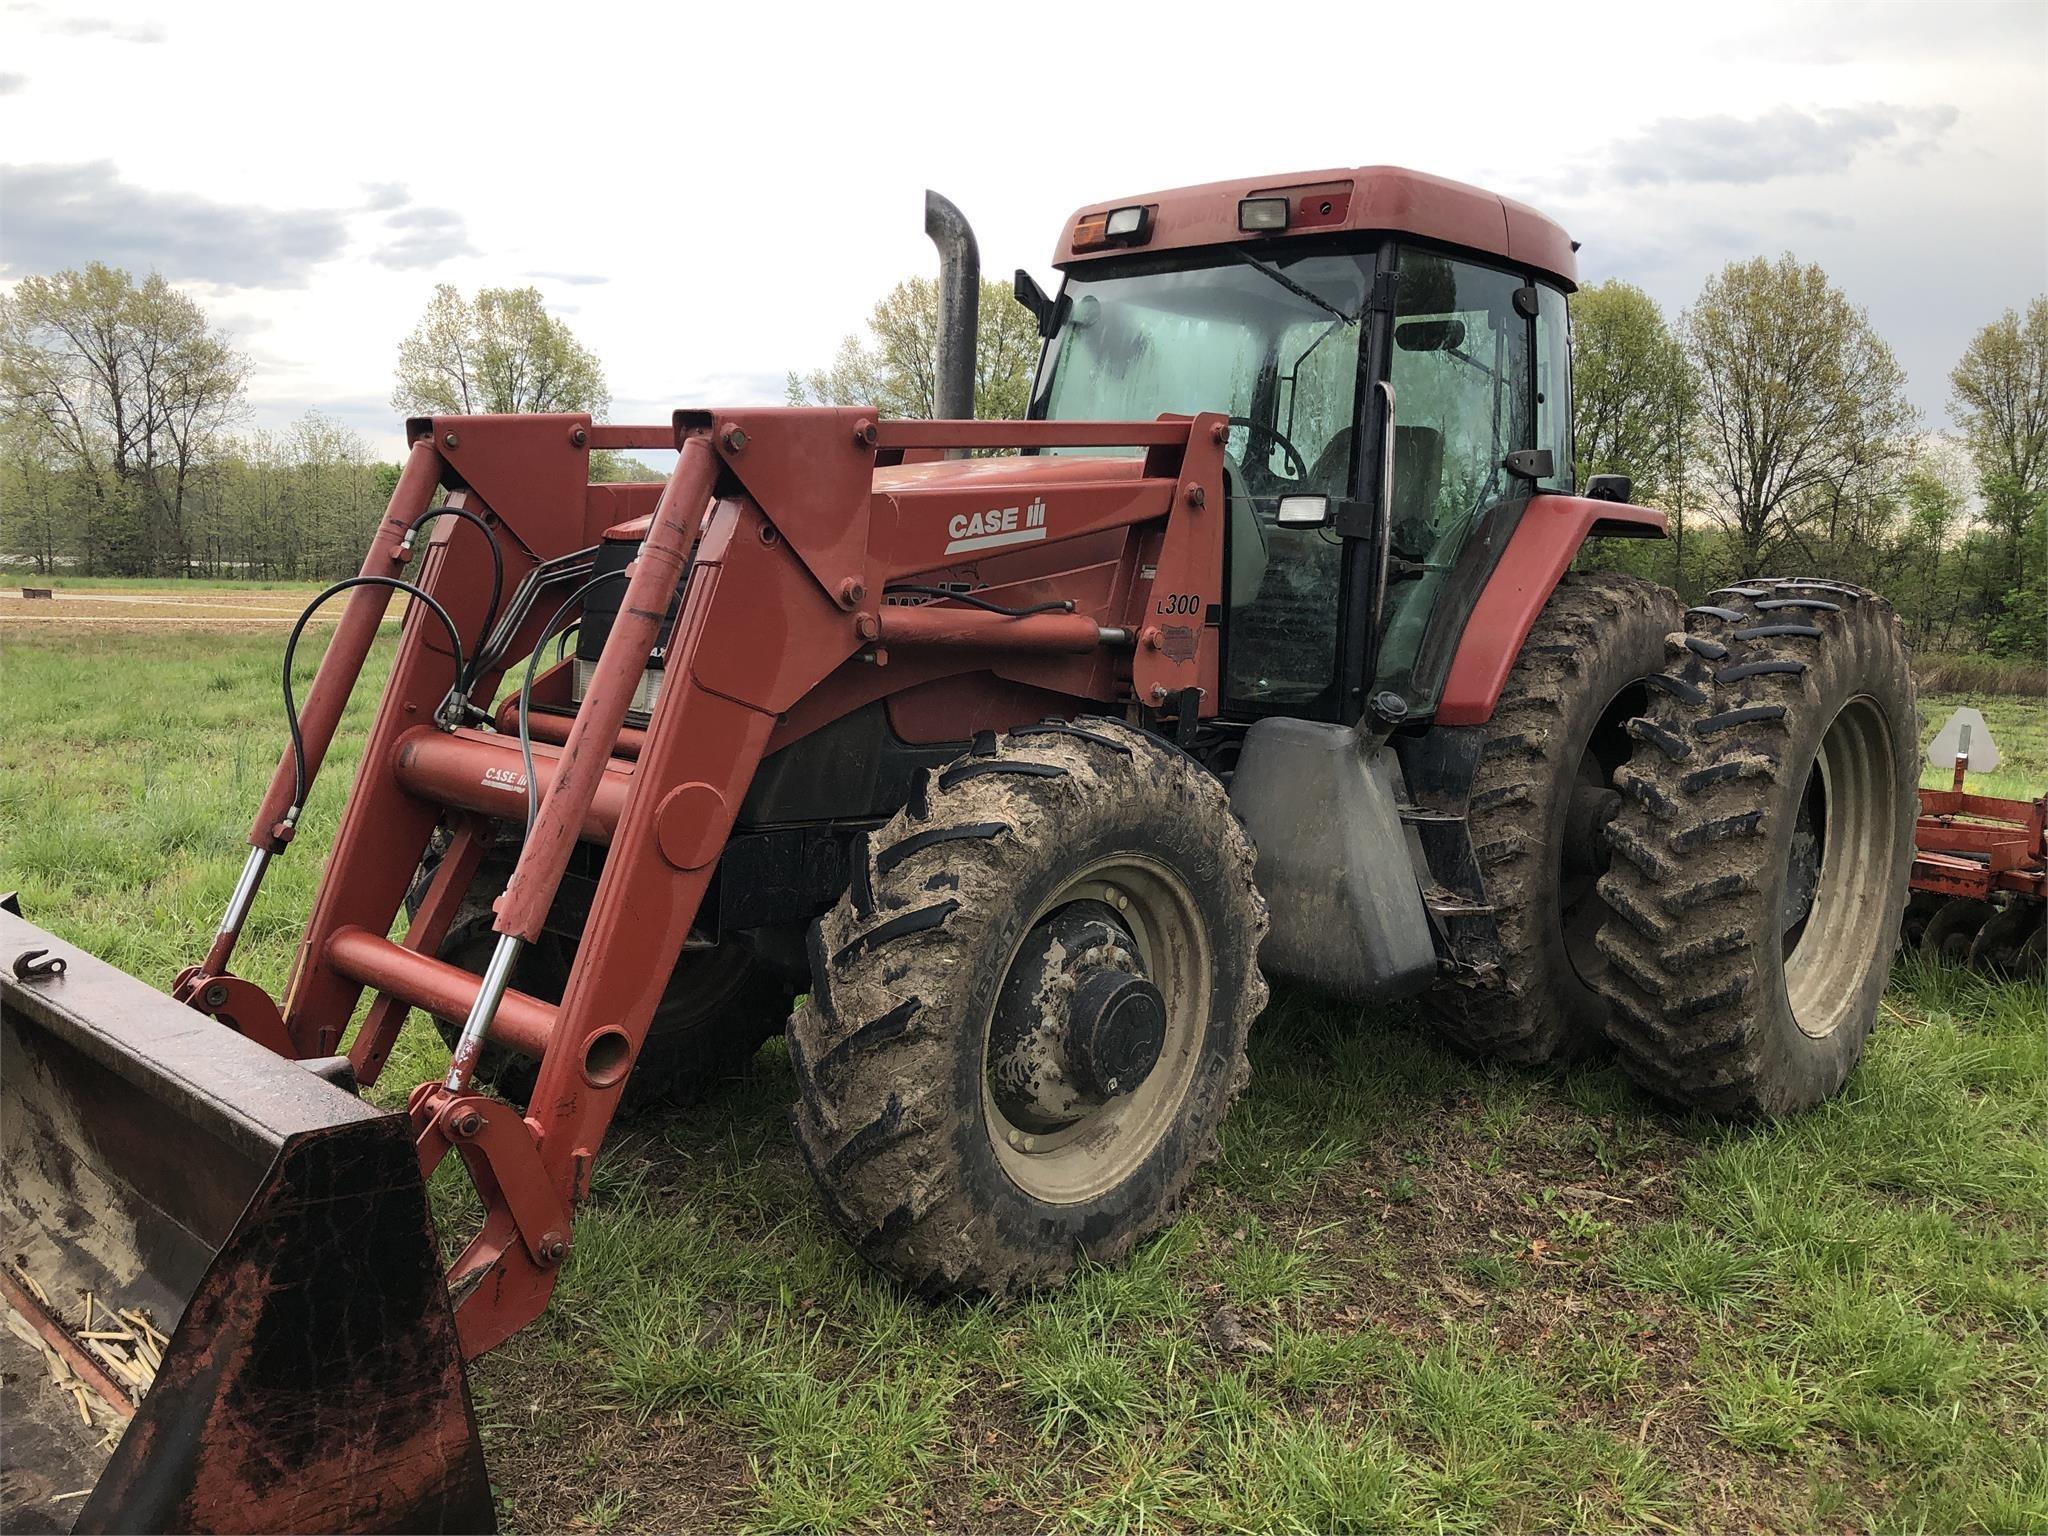 1998 Case IH MX170 Tractor